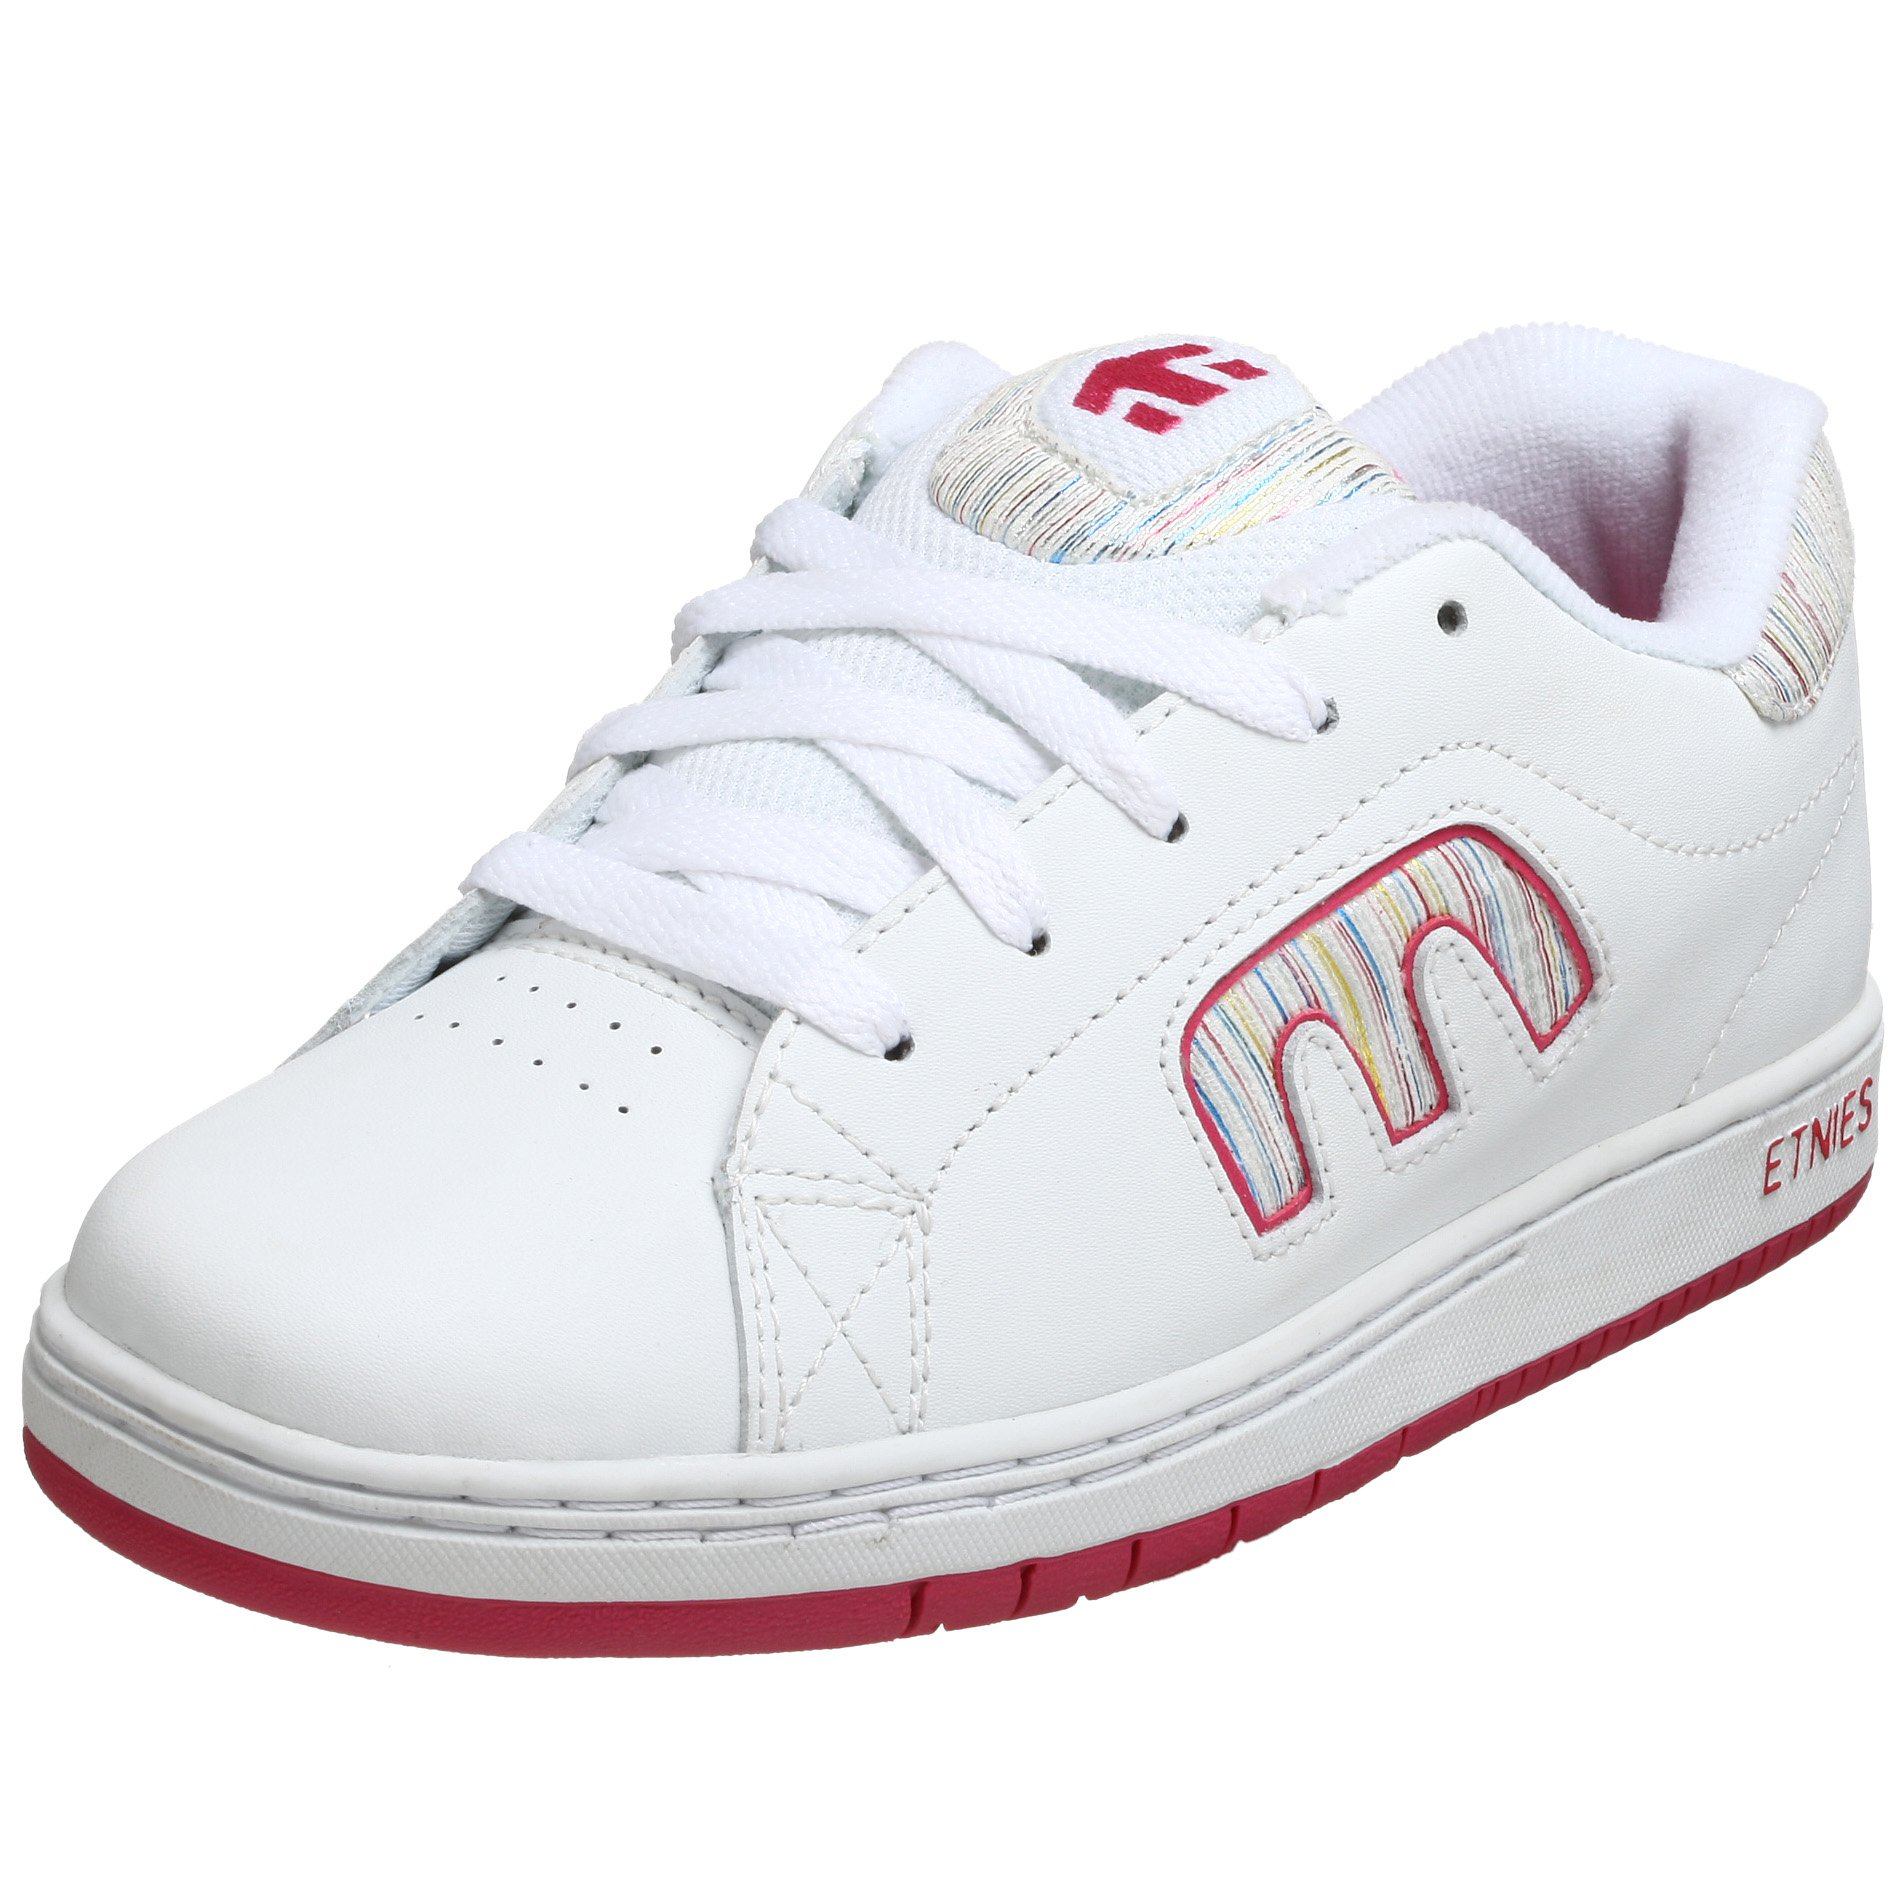 Etnies Little Kid/Big Kid Callicut Sneaker,Pink/White,4 M US Big Kid